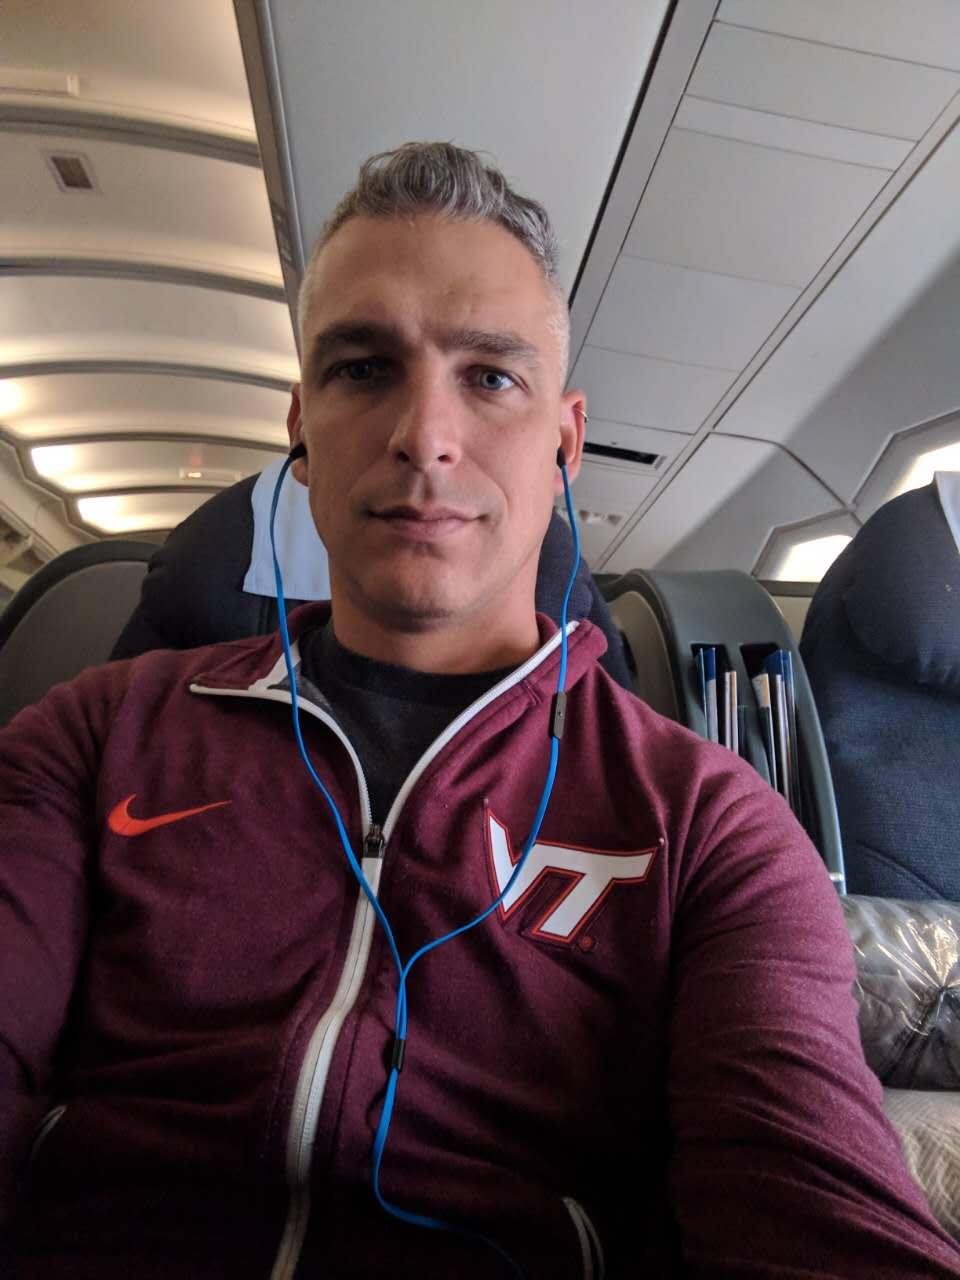 Virginia Tech season ticket holder Richie Weldon travelled over 16,000 miles round-trip to see the Clemson-Virginia Tech football game.